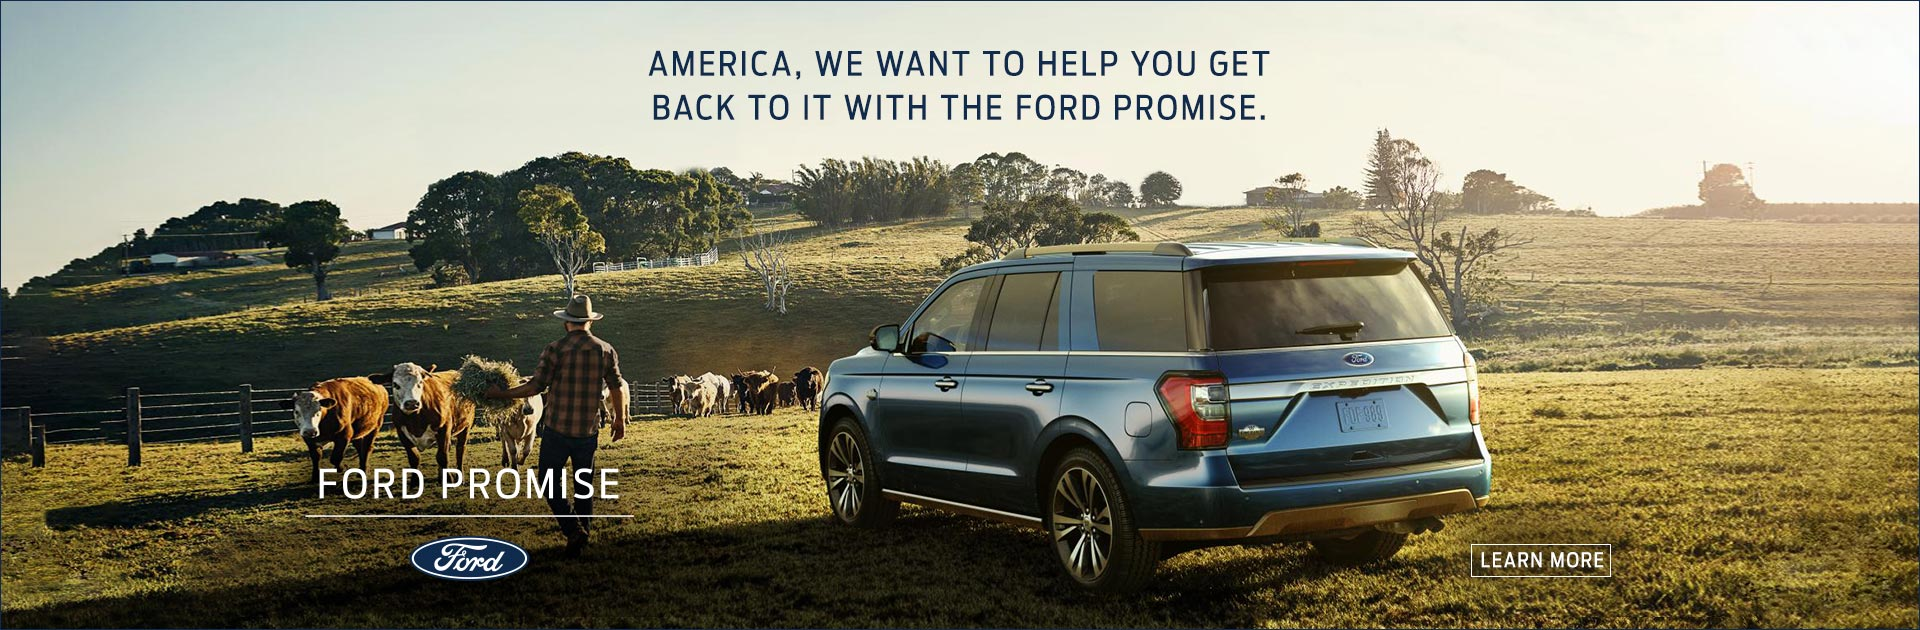 2020 Junjulaugsep Fordpromise Jaz 1920x630